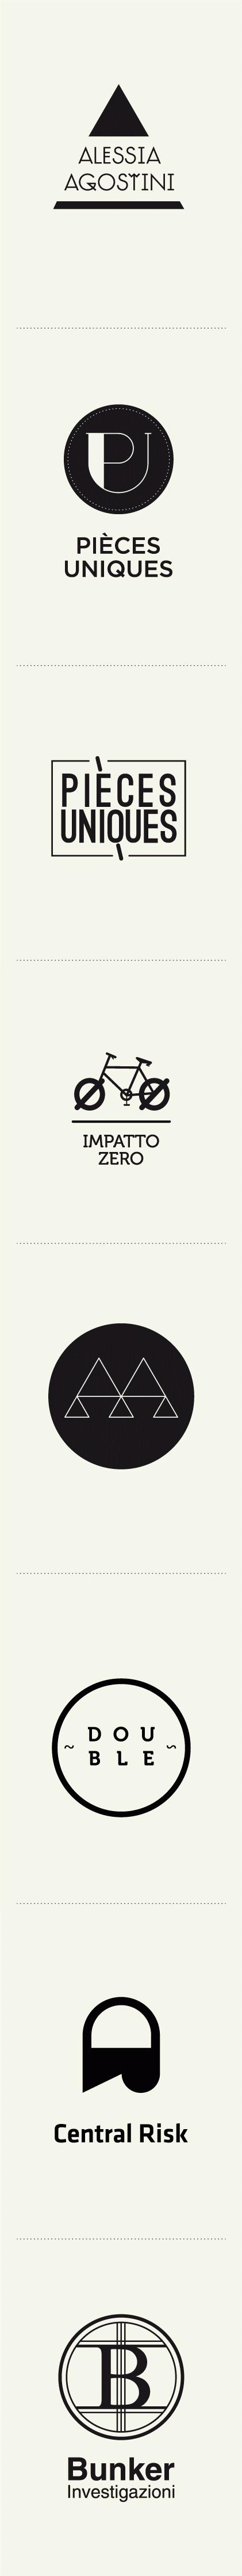 Some logos from my 2011 exercise collection. #branding #logos #logodesign